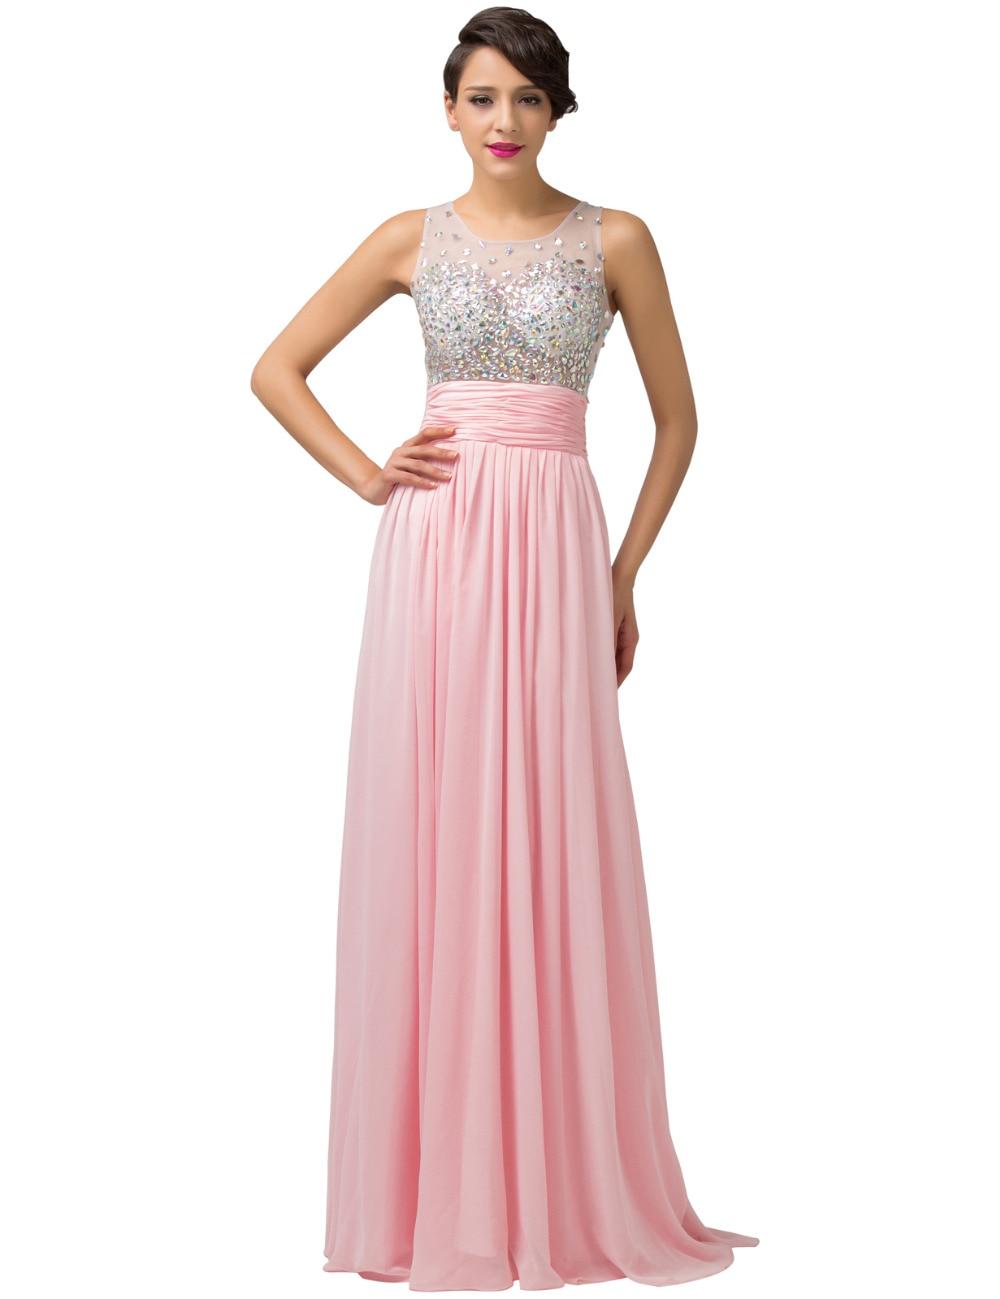 Aliexpress.com : Buy New Light pink evening dresses long 2016 Sexy ...